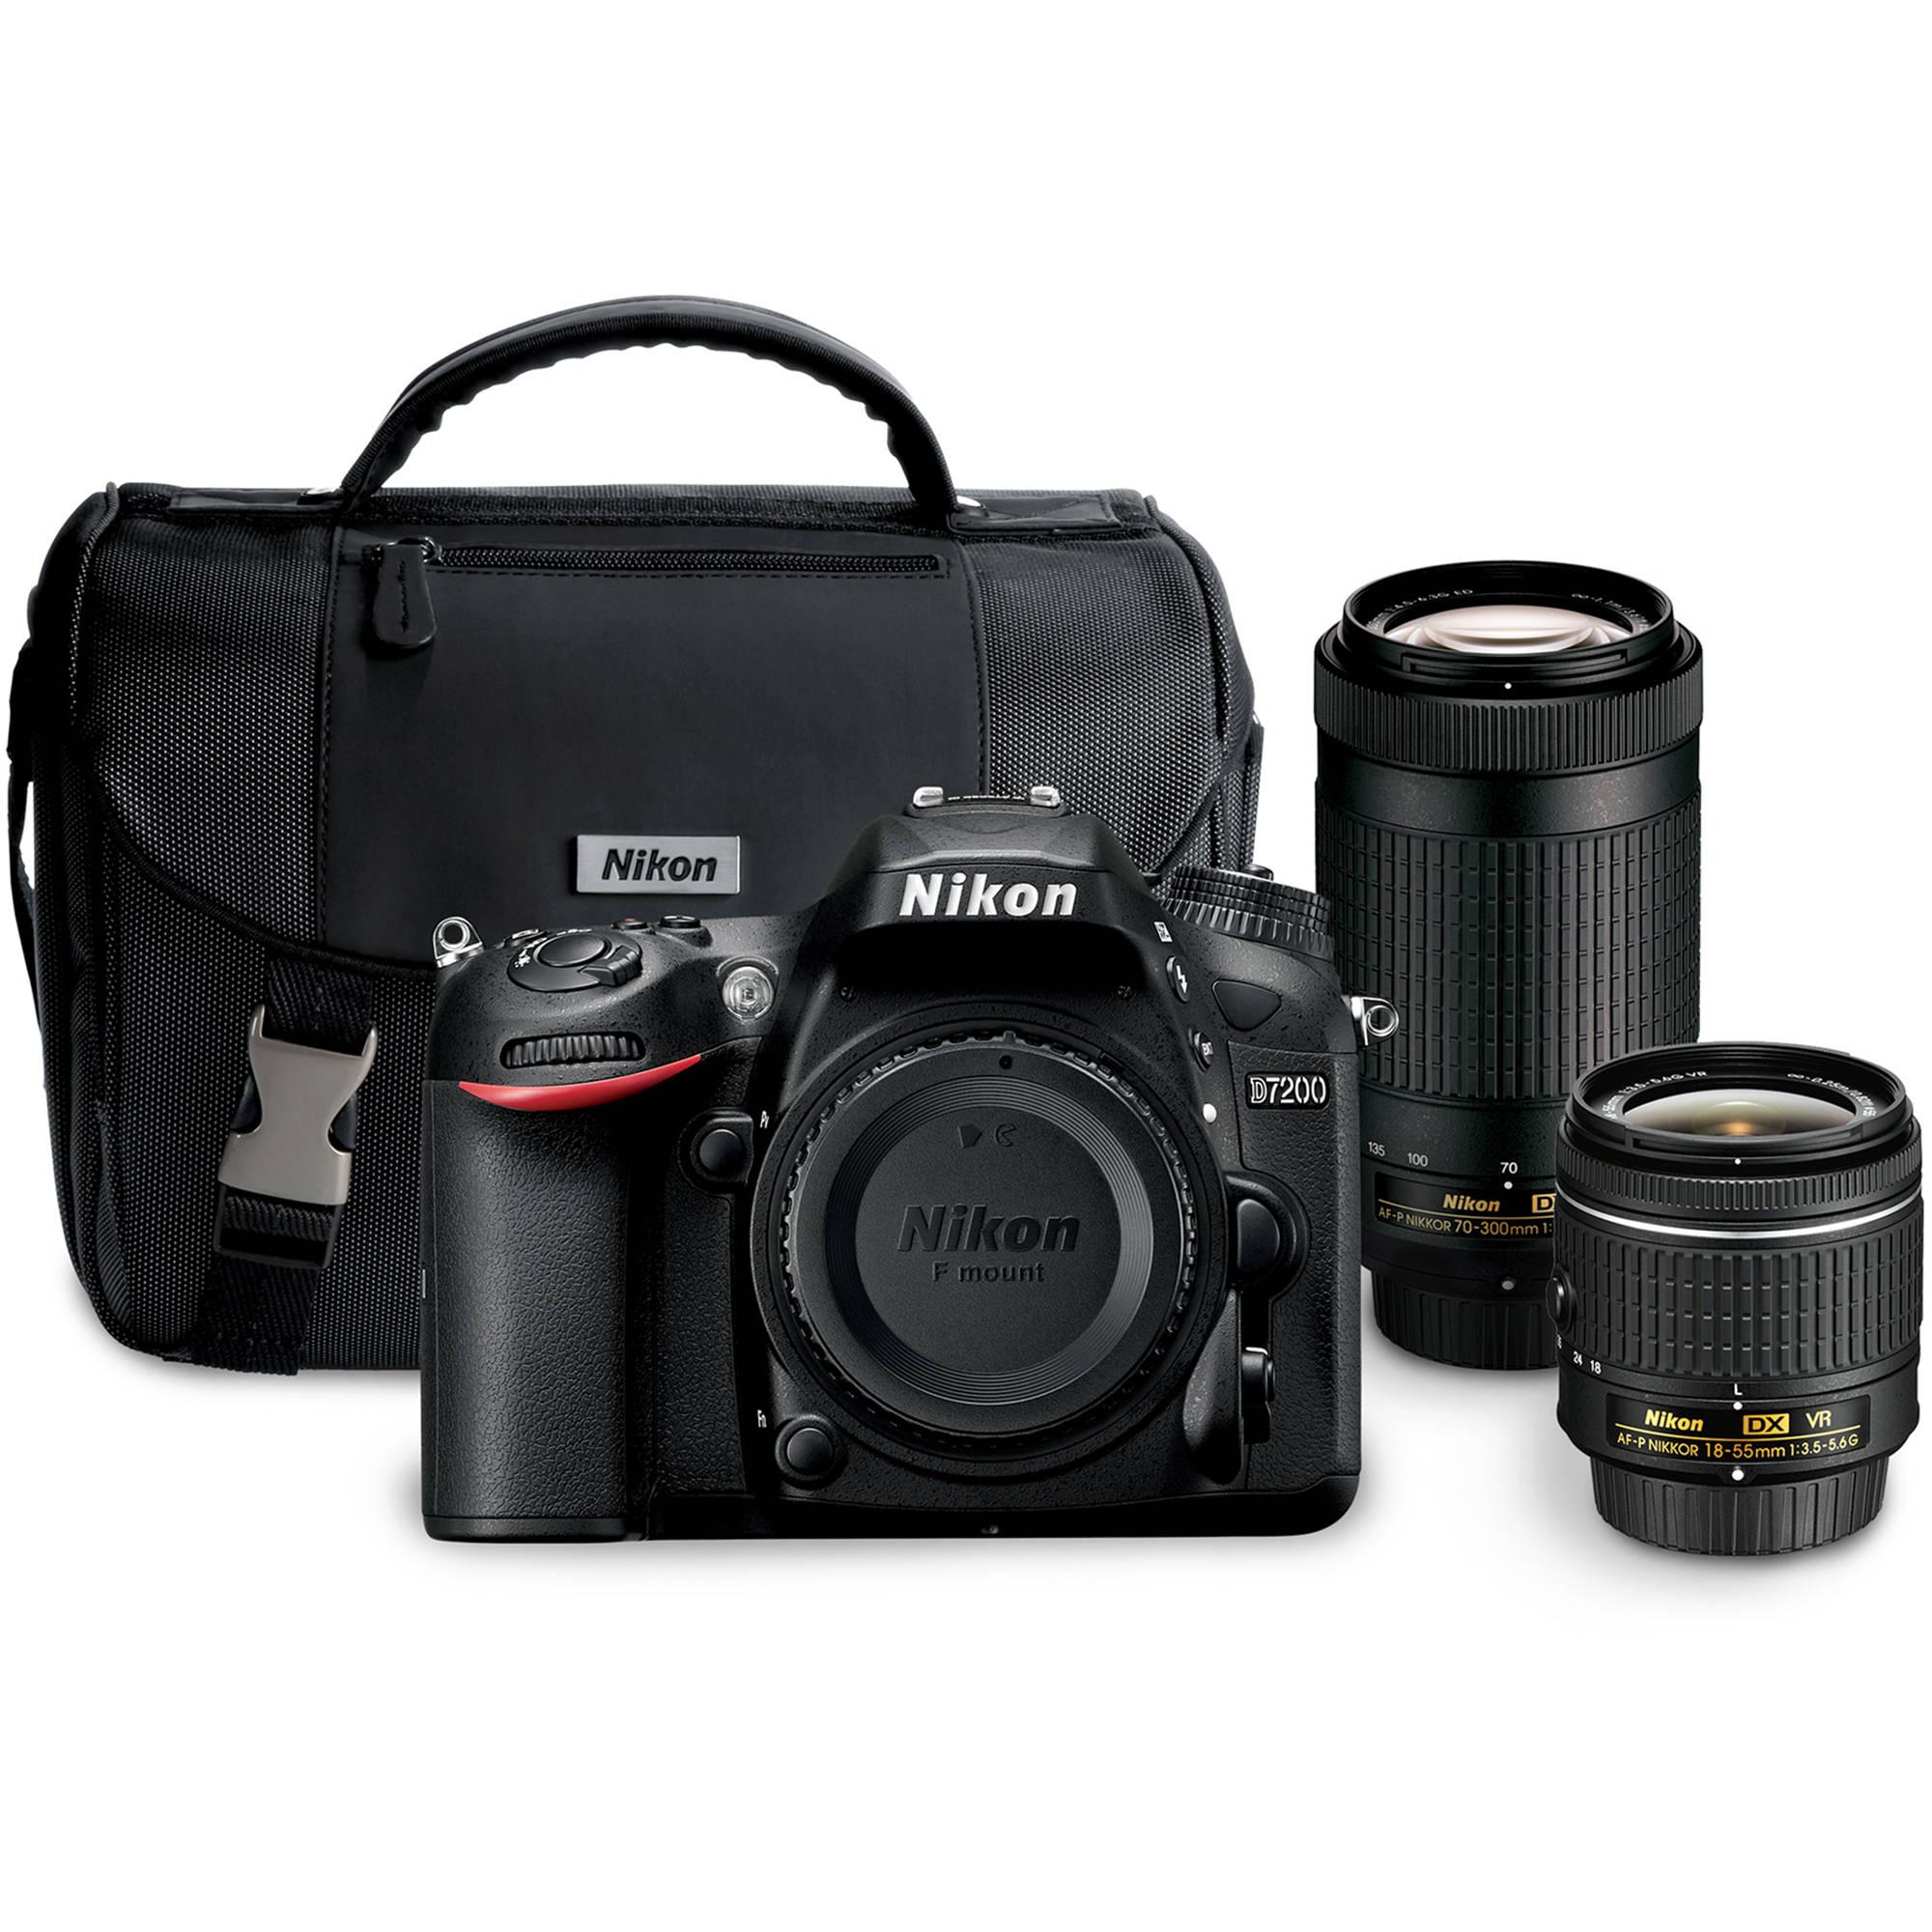 Nikon D7200 Dslr Camera With 18 55mm And 70 300mm Lenses Kit